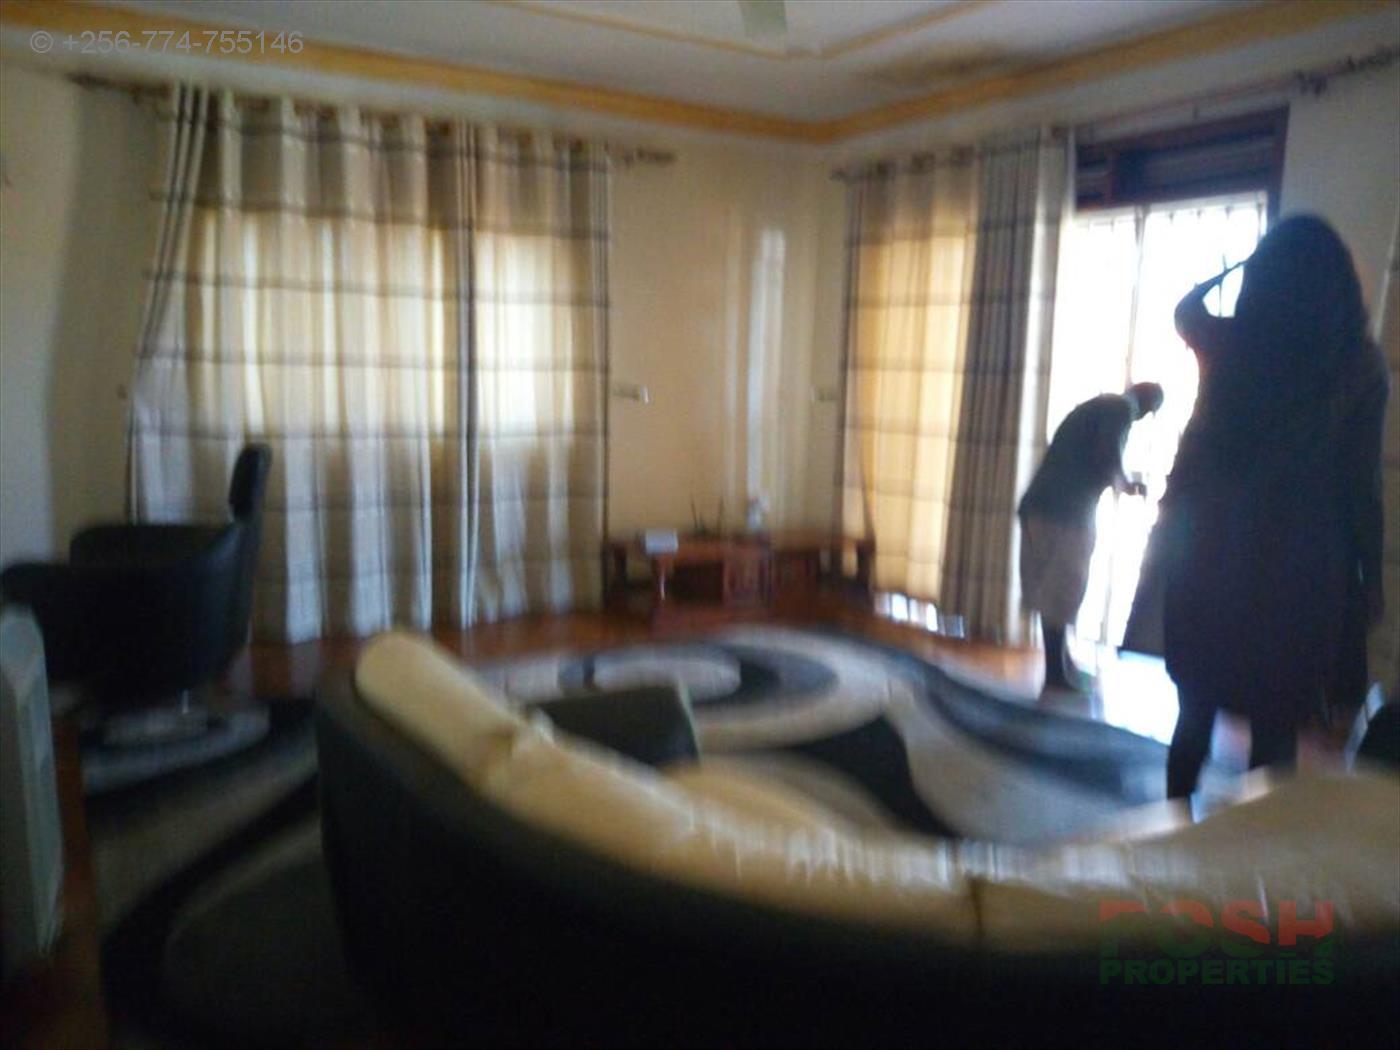 Mansion for rent in Ggaba Kampala